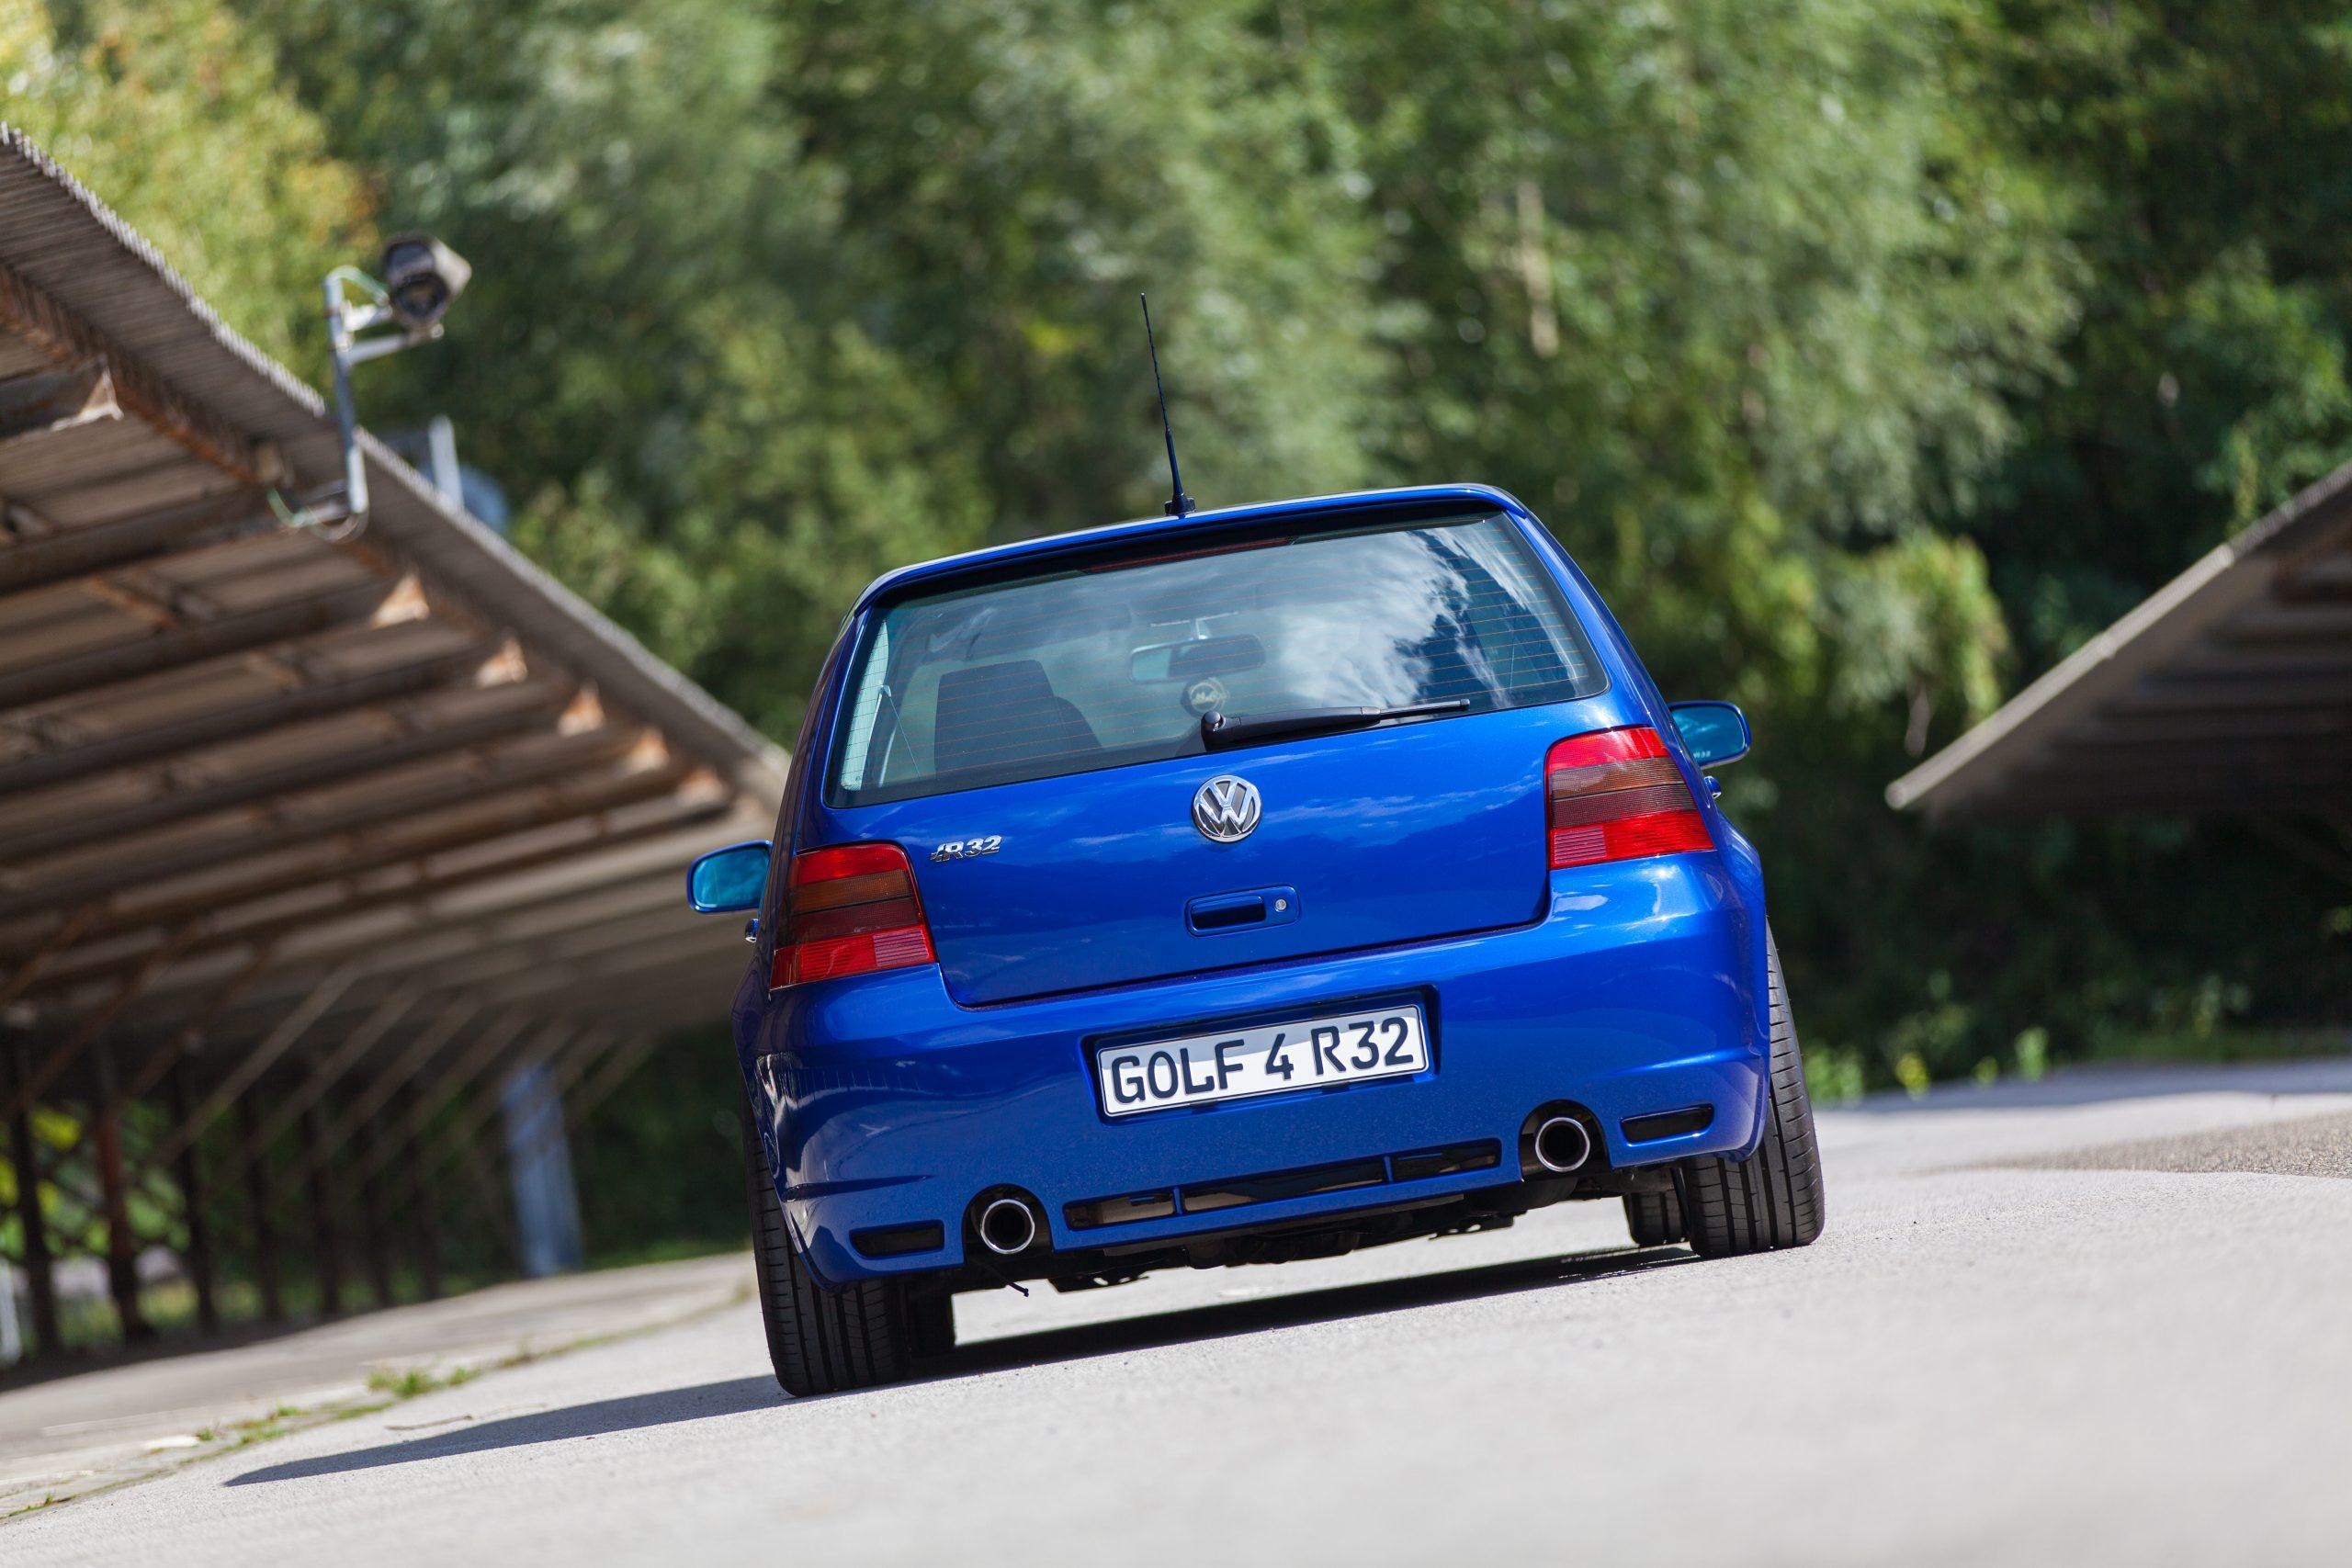 VW Golf 4 R32 deepblue